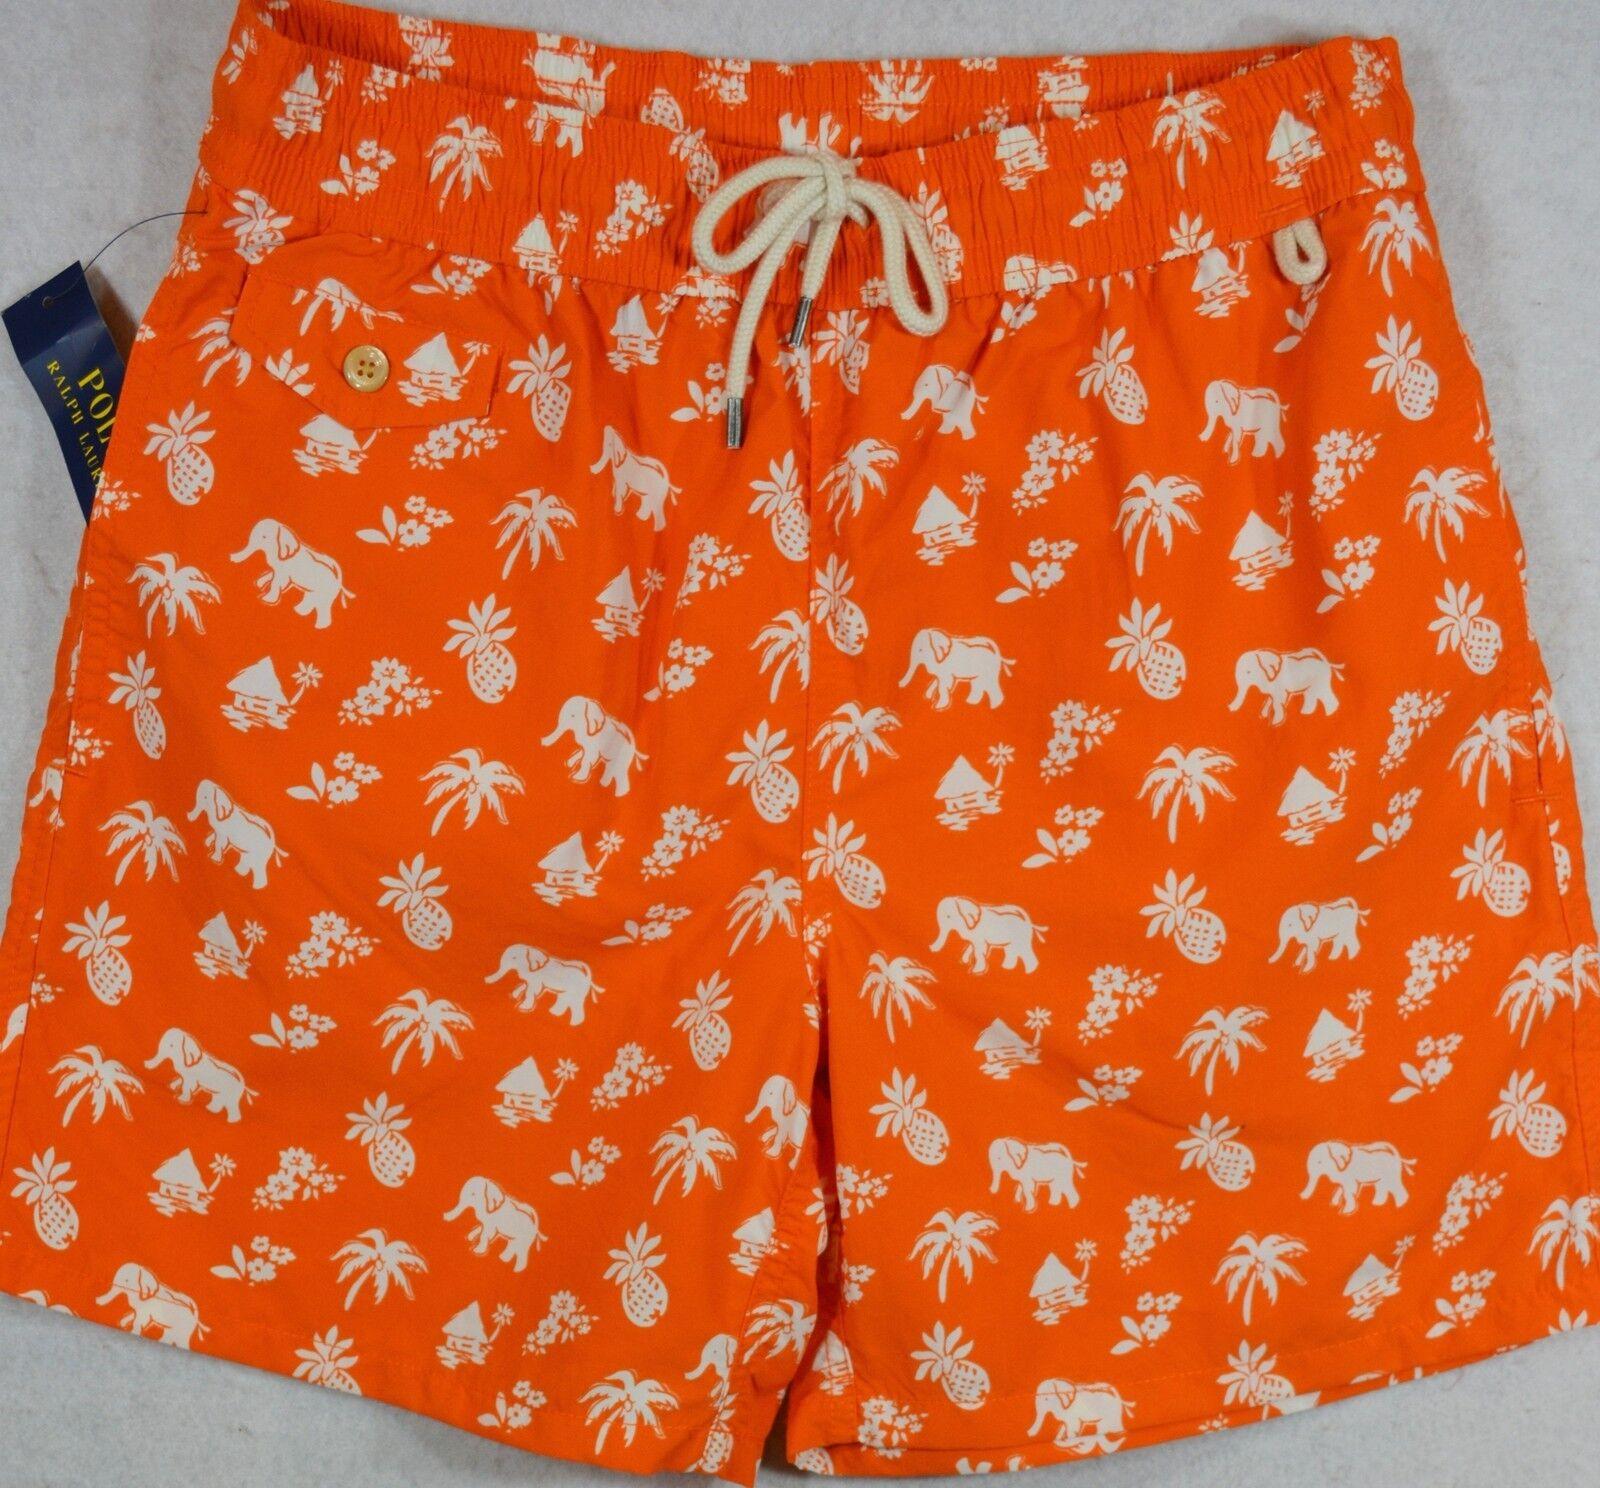 Polo Ralph Lauren Swim Shorts Swimming Trunk Elephant Palm Pineapple L NWT